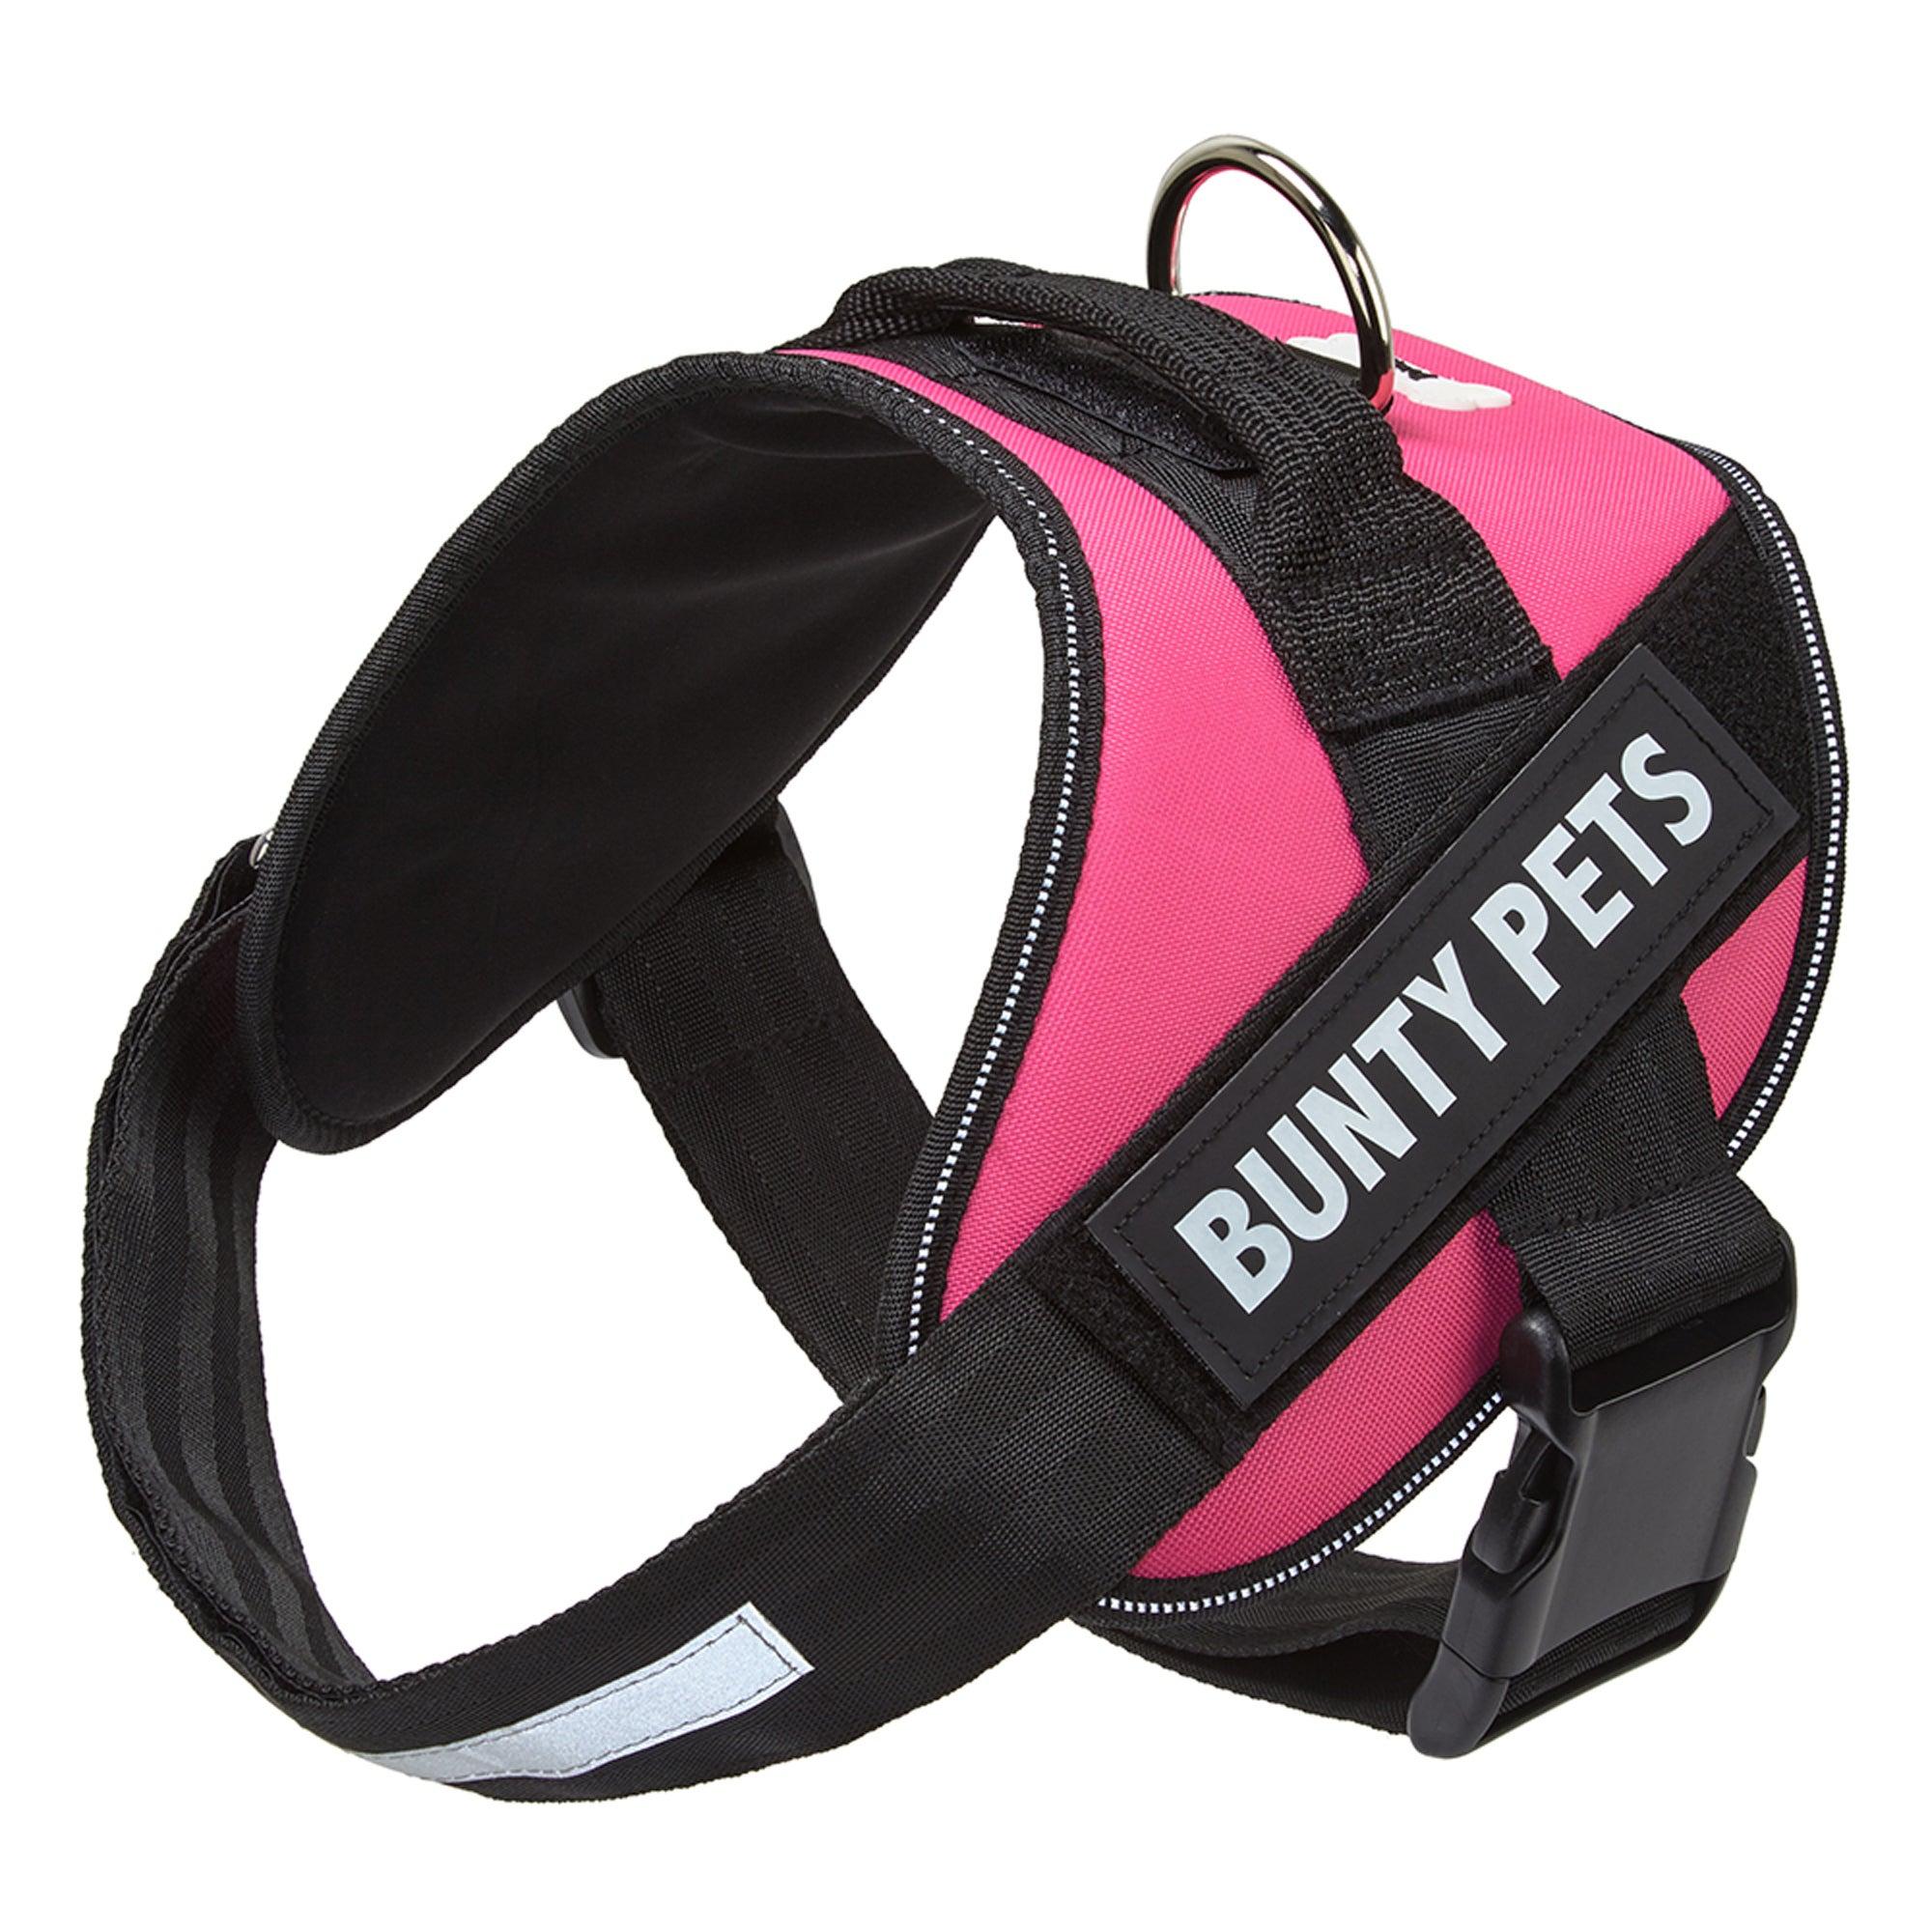 Bunty Pink Yukon Dog Harness Pink